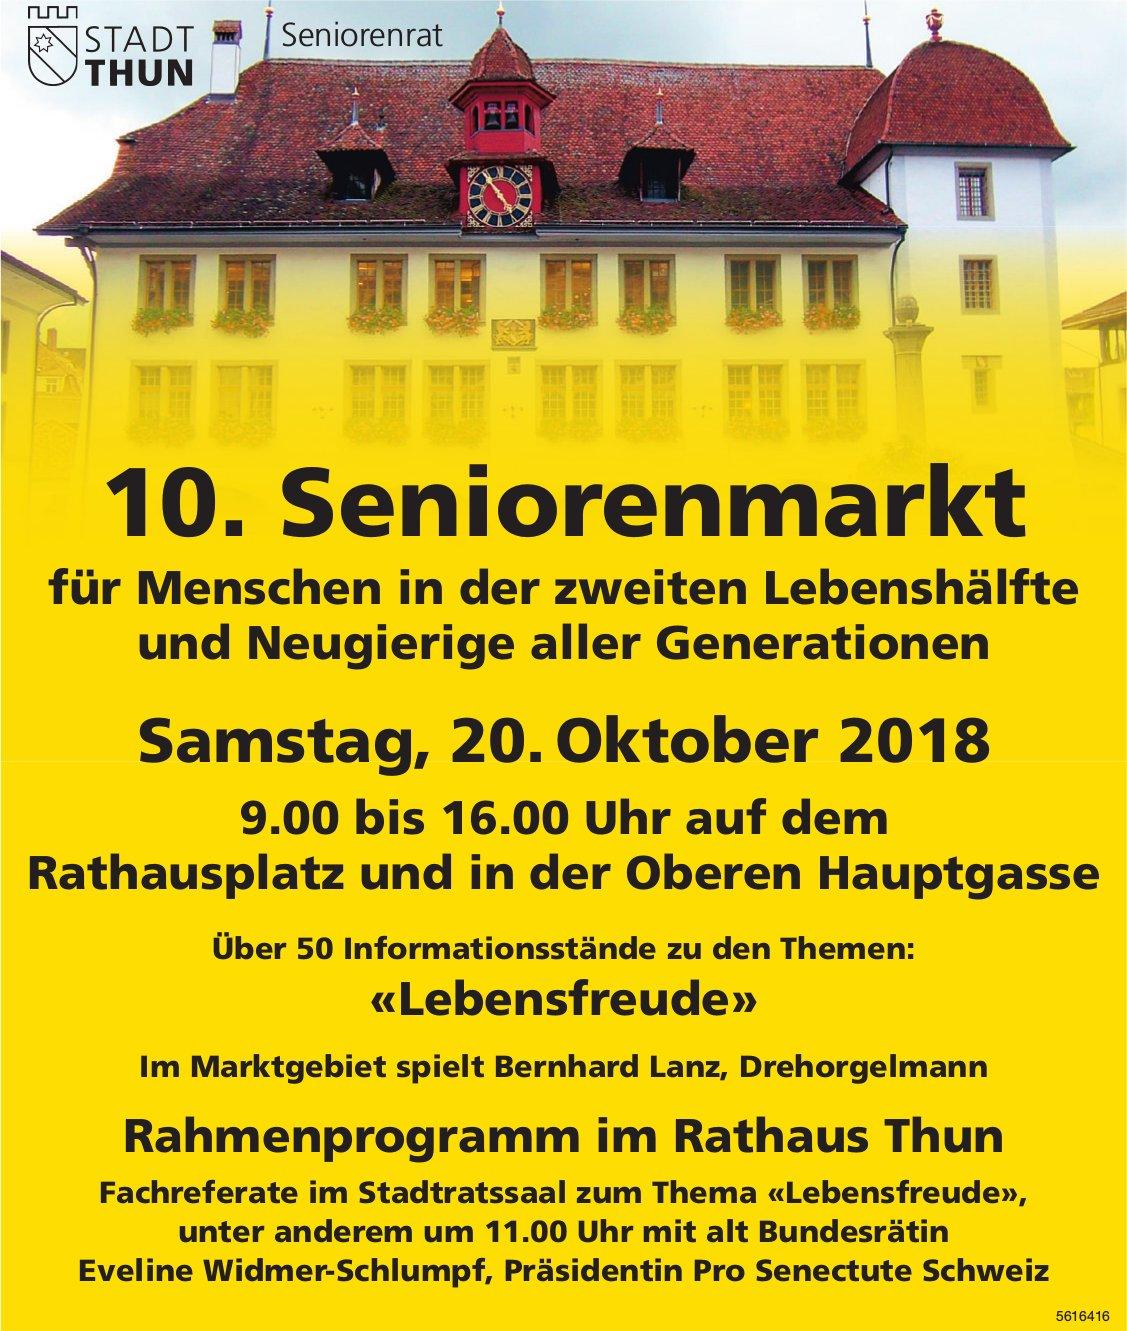 10. Seniorenmarkt am 20. Oktober